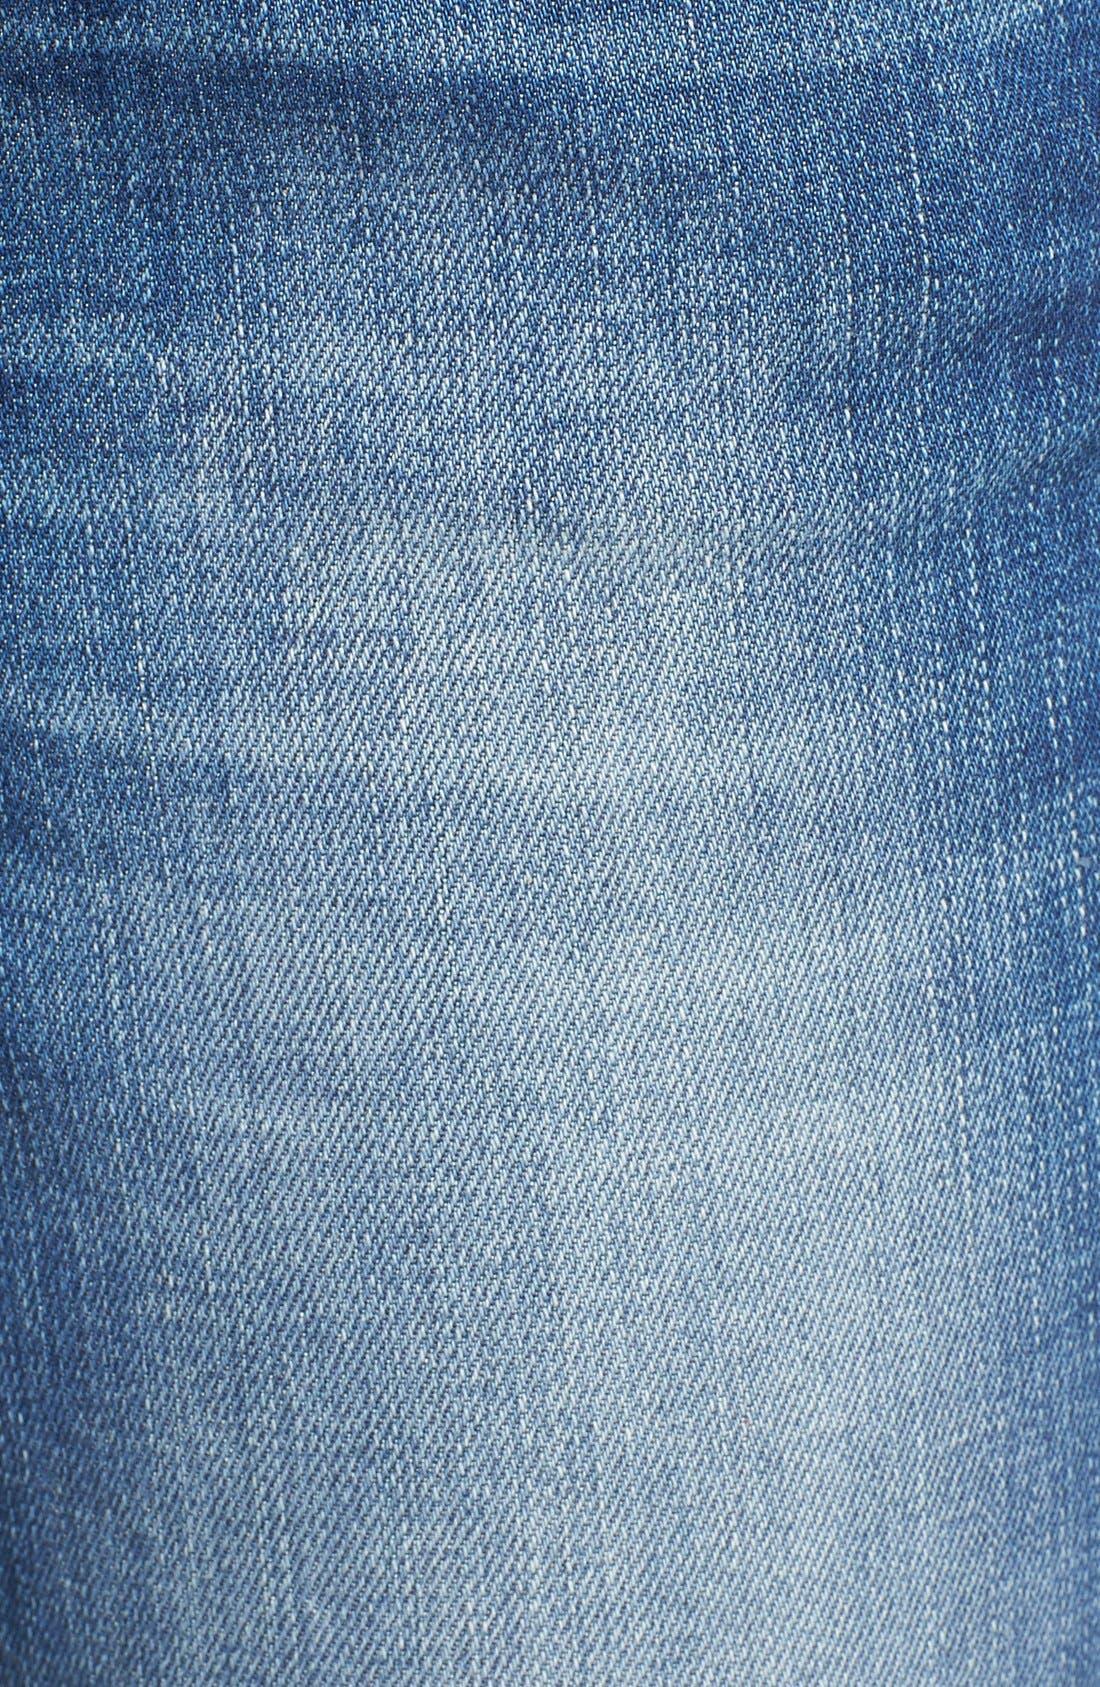 'Emma' Stretch Slim Boyfriend Jeans,                             Alternate thumbnail 6, color,                             Emma Shaded Vintage